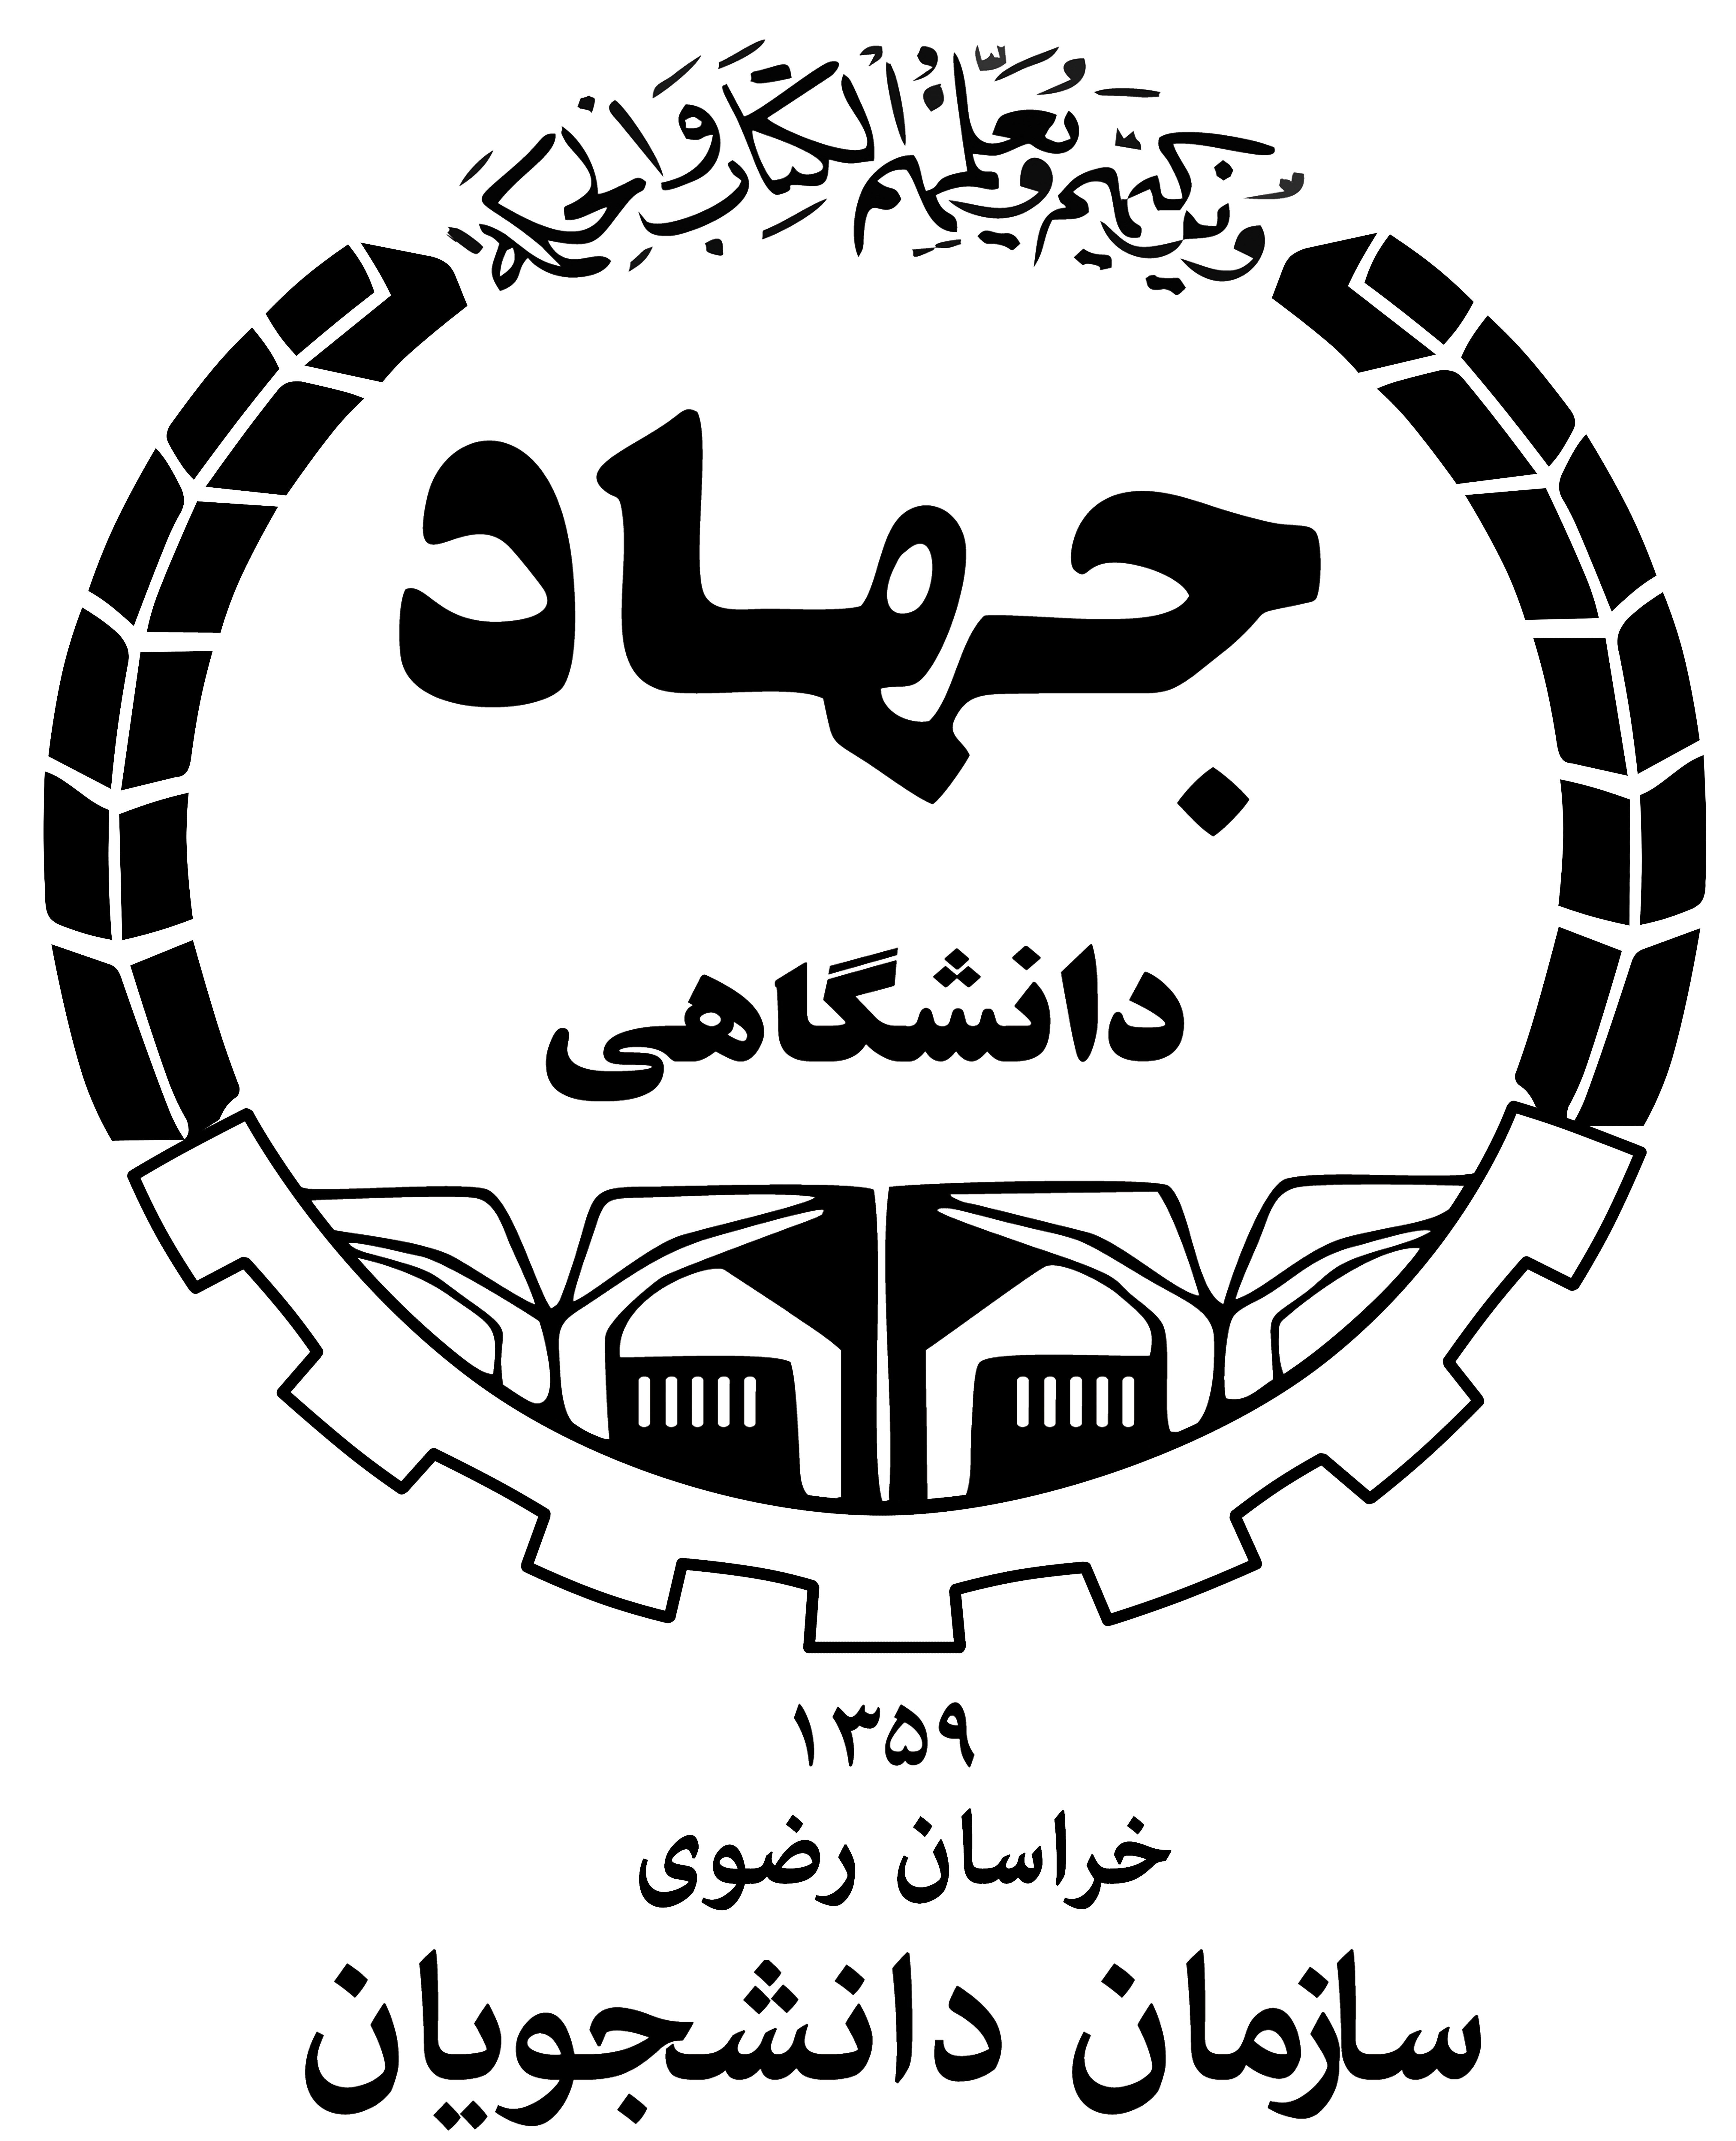 لوگوی سازمان